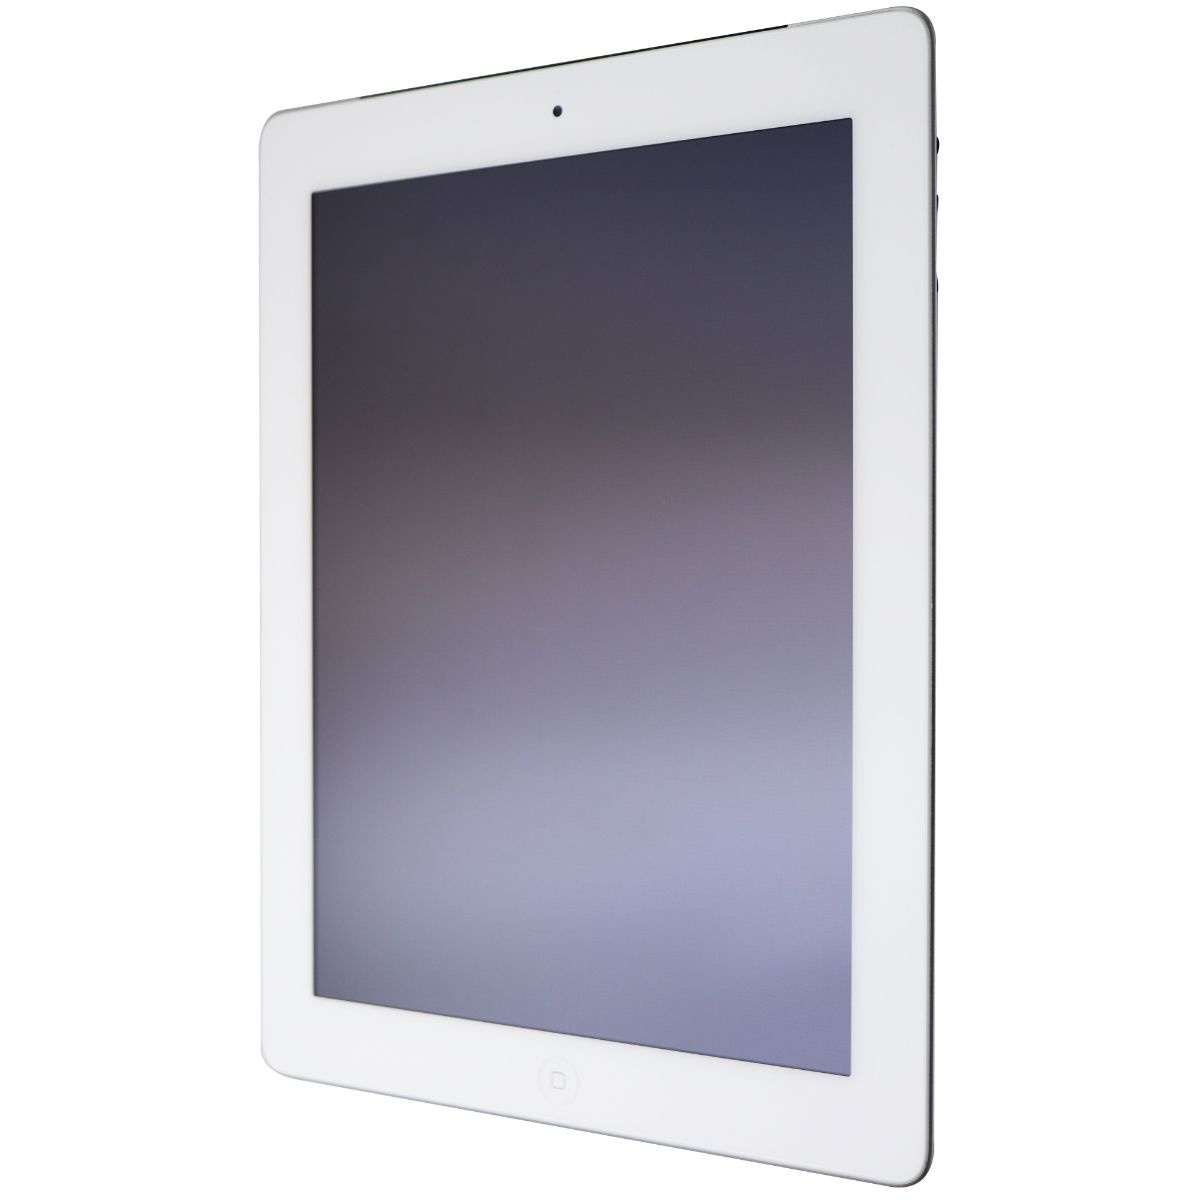 Apple iPad 9.7 (3rd Gen) A1430 (MD371C/A) Wi-Fi + Verizon - 64GB / White